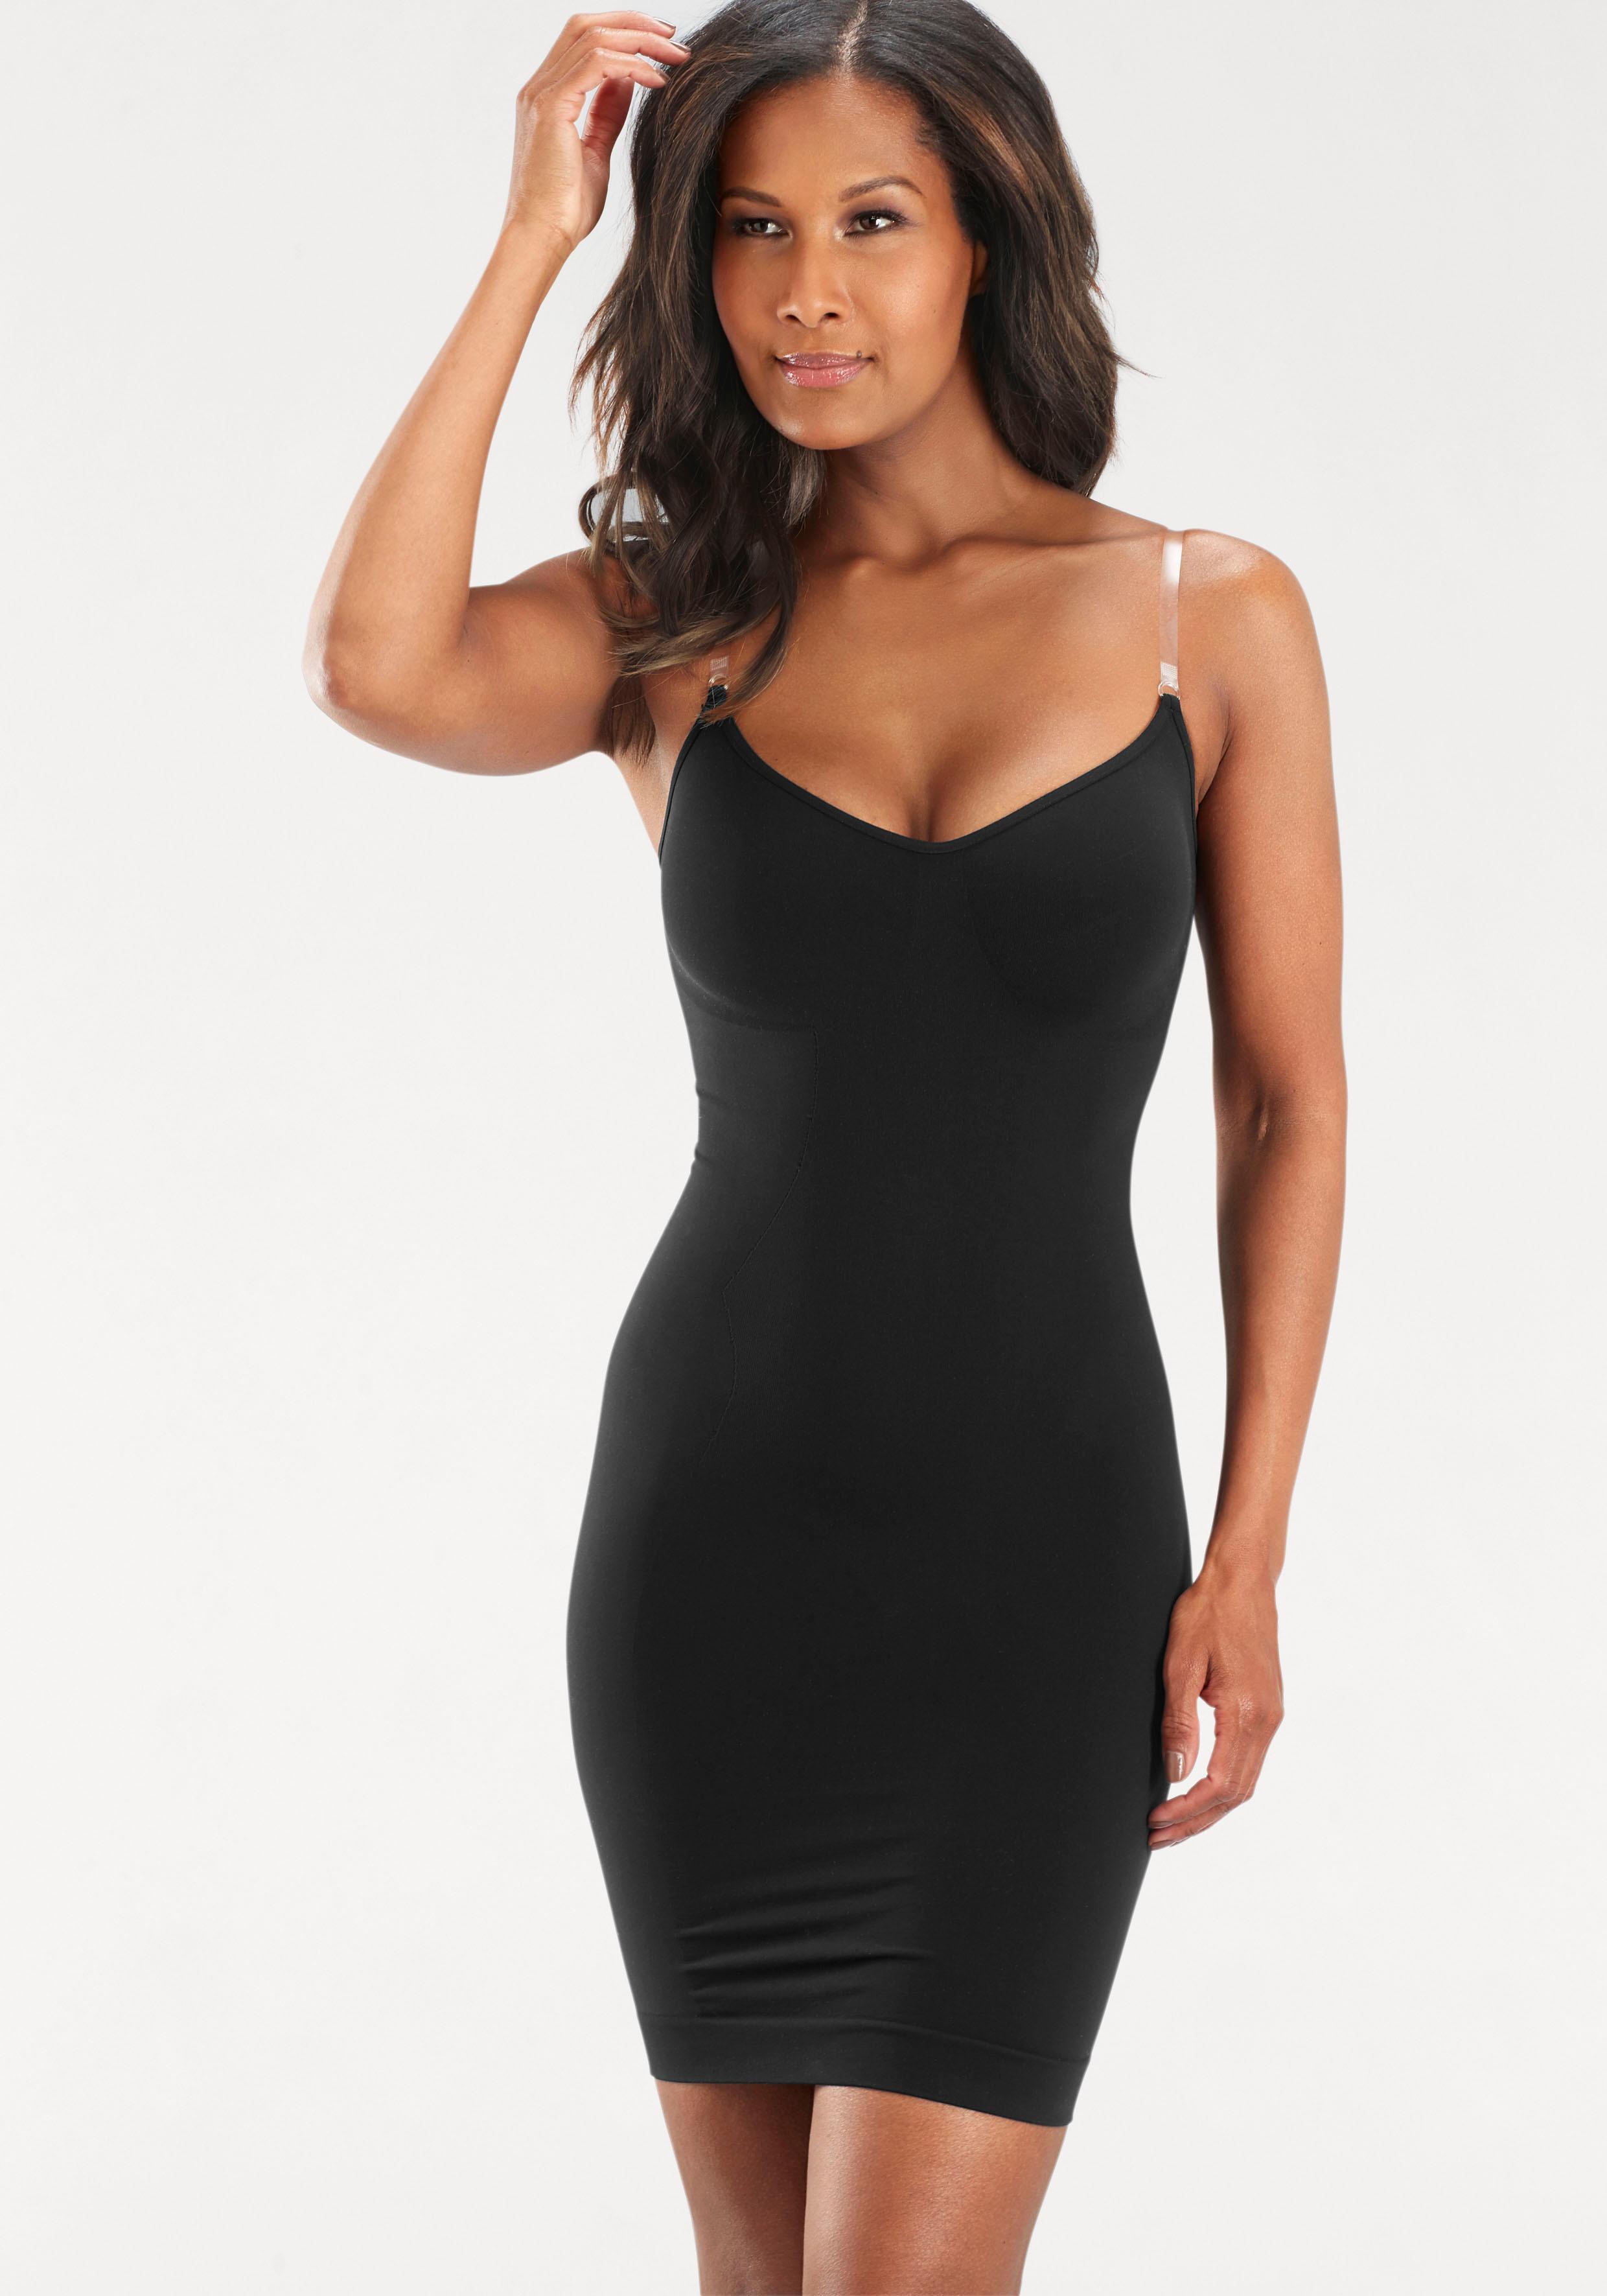 LASCANA Shaping-Kleid Damenmode/Wäsche & Bademode/Damenwäsche/Shapewear/Bodyshaping